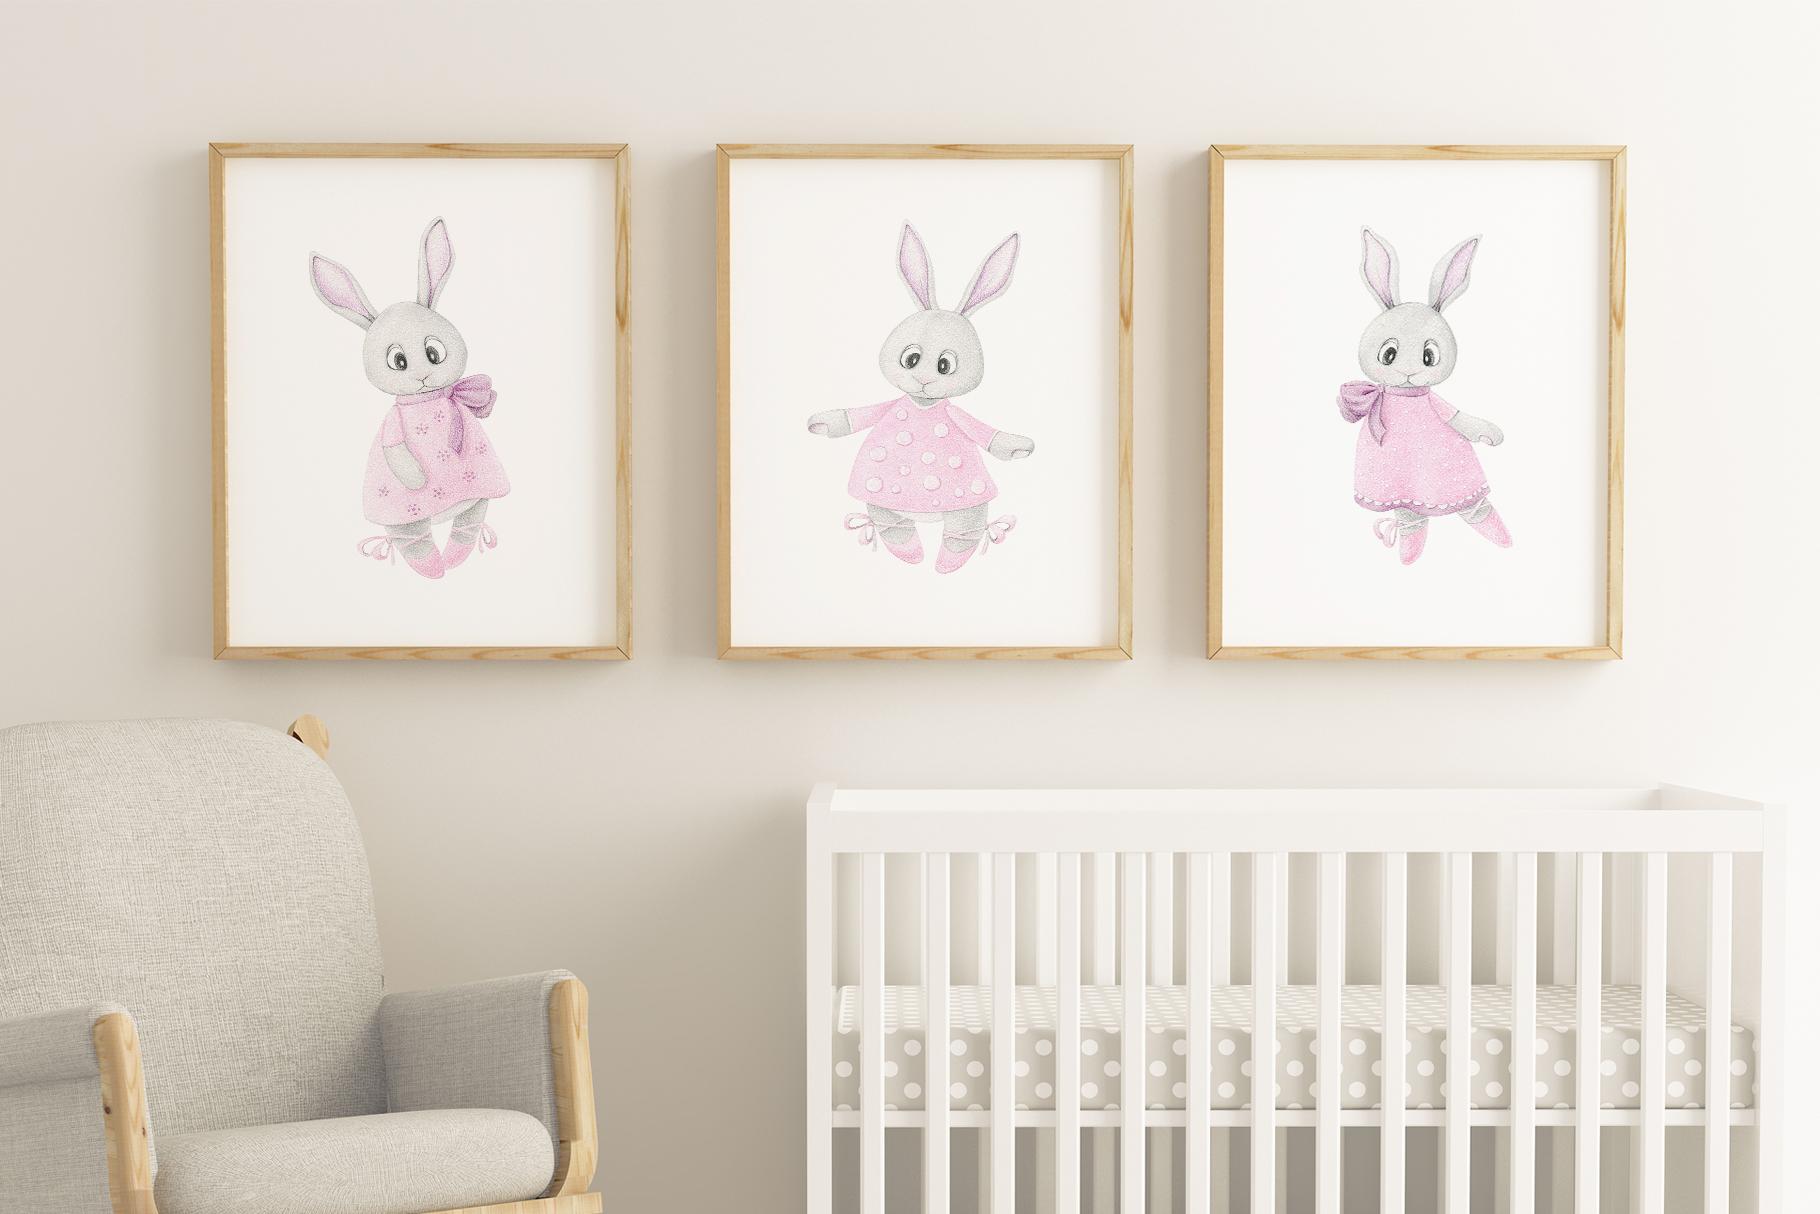 Cute bunny ballet dancer example image 2